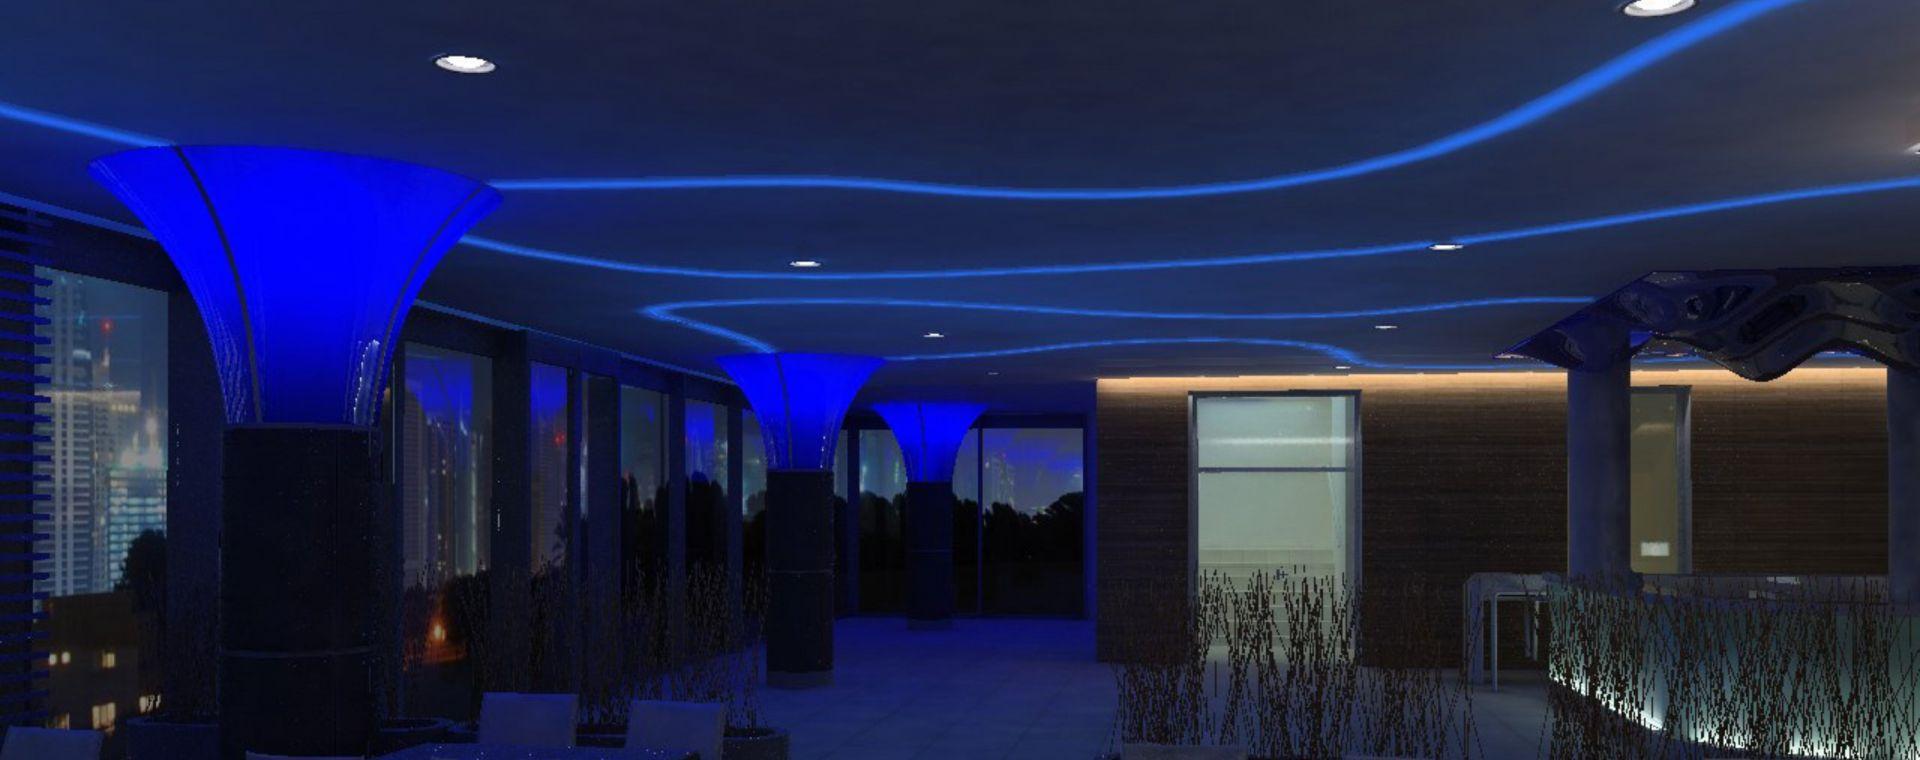 Wellness Pardubice - lighting design, Pardubice, Pardubice region, 2011, CZ